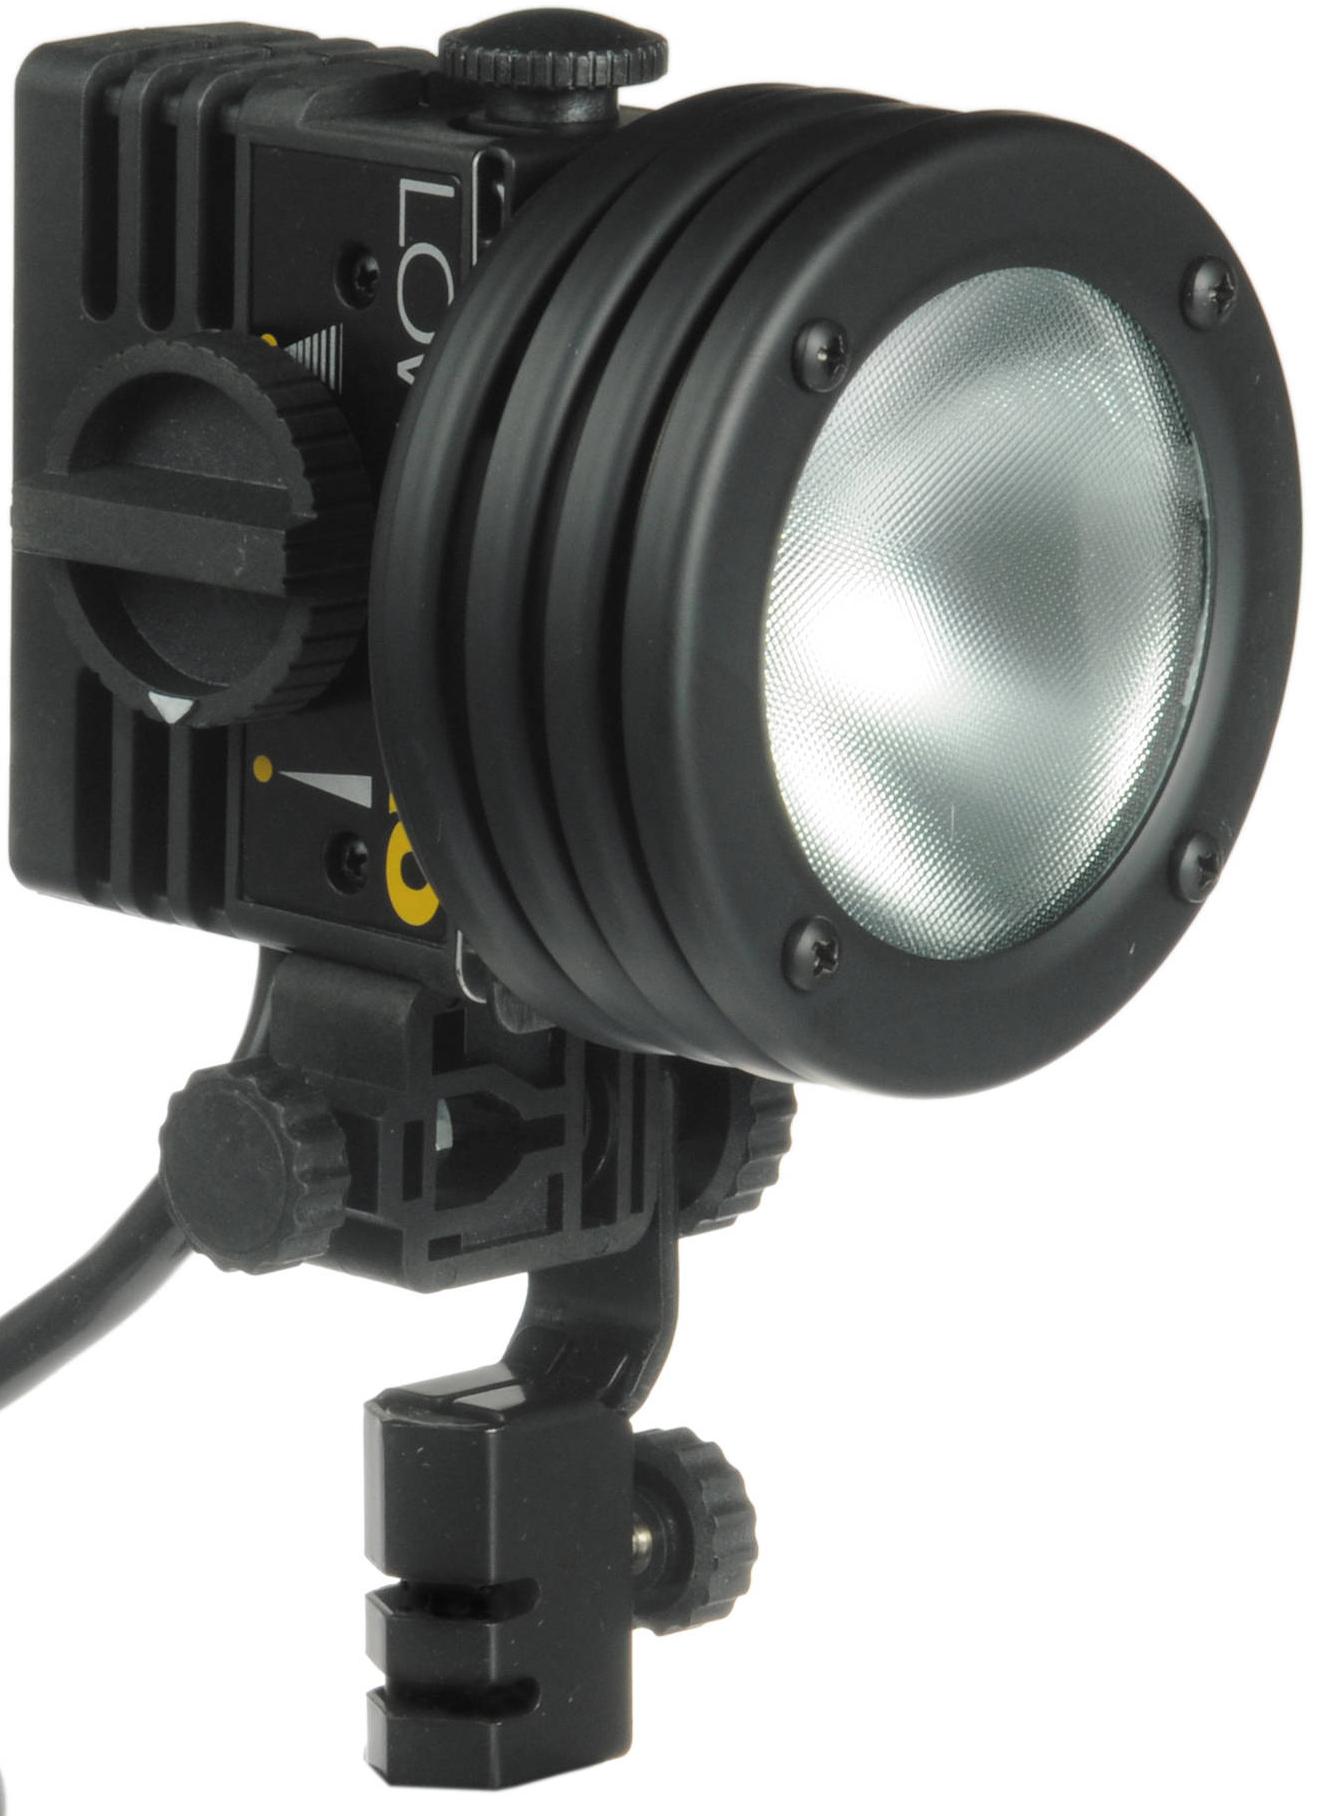 Lithium Ion Camera Ring Lights